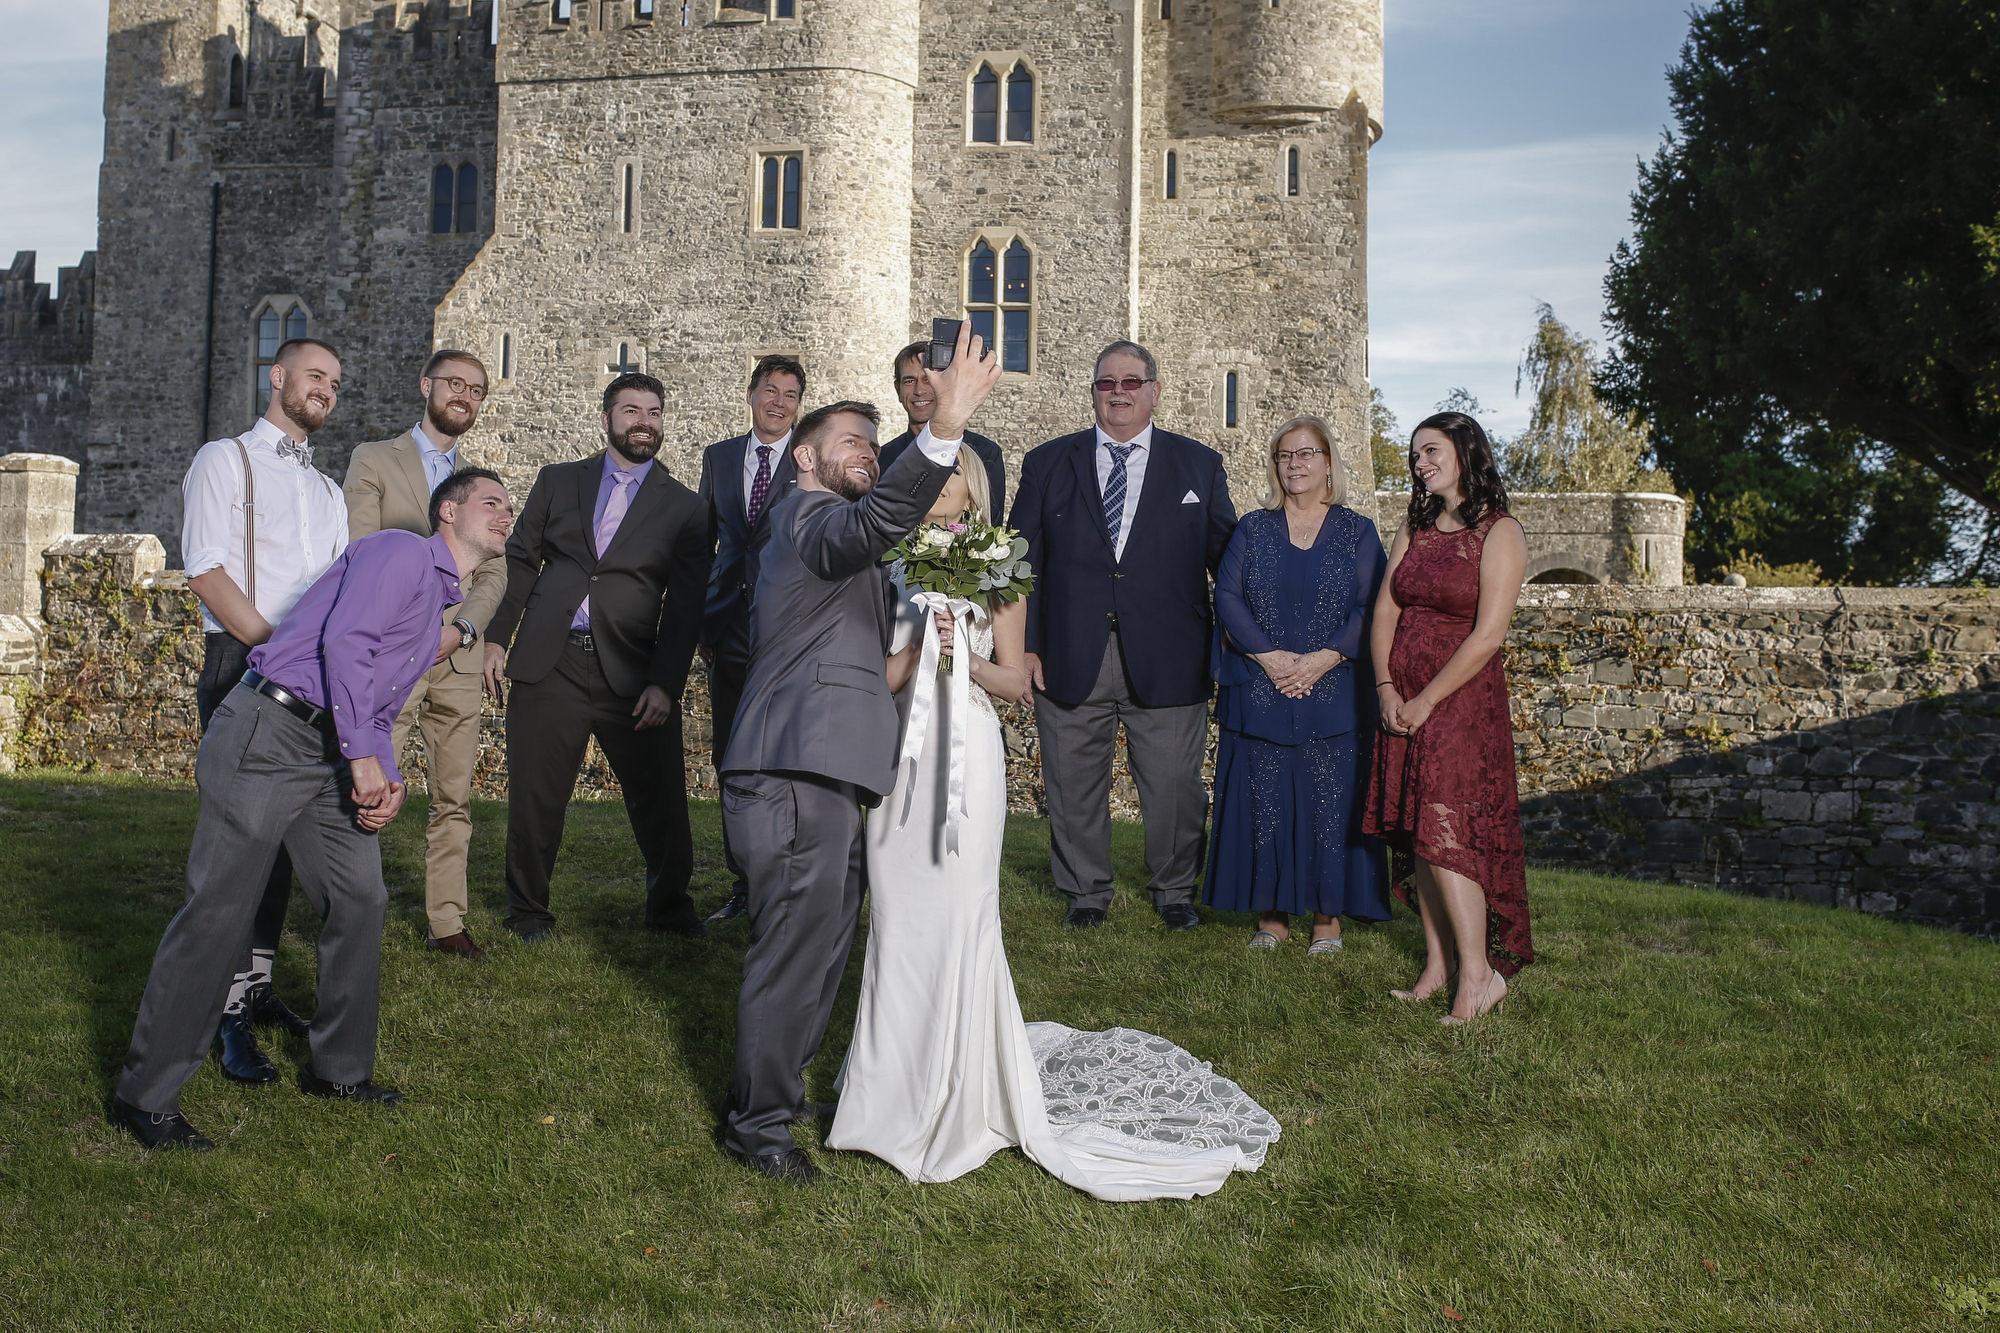 kilkea_castle_wedding_photographer_goldenmoments_039.jpg